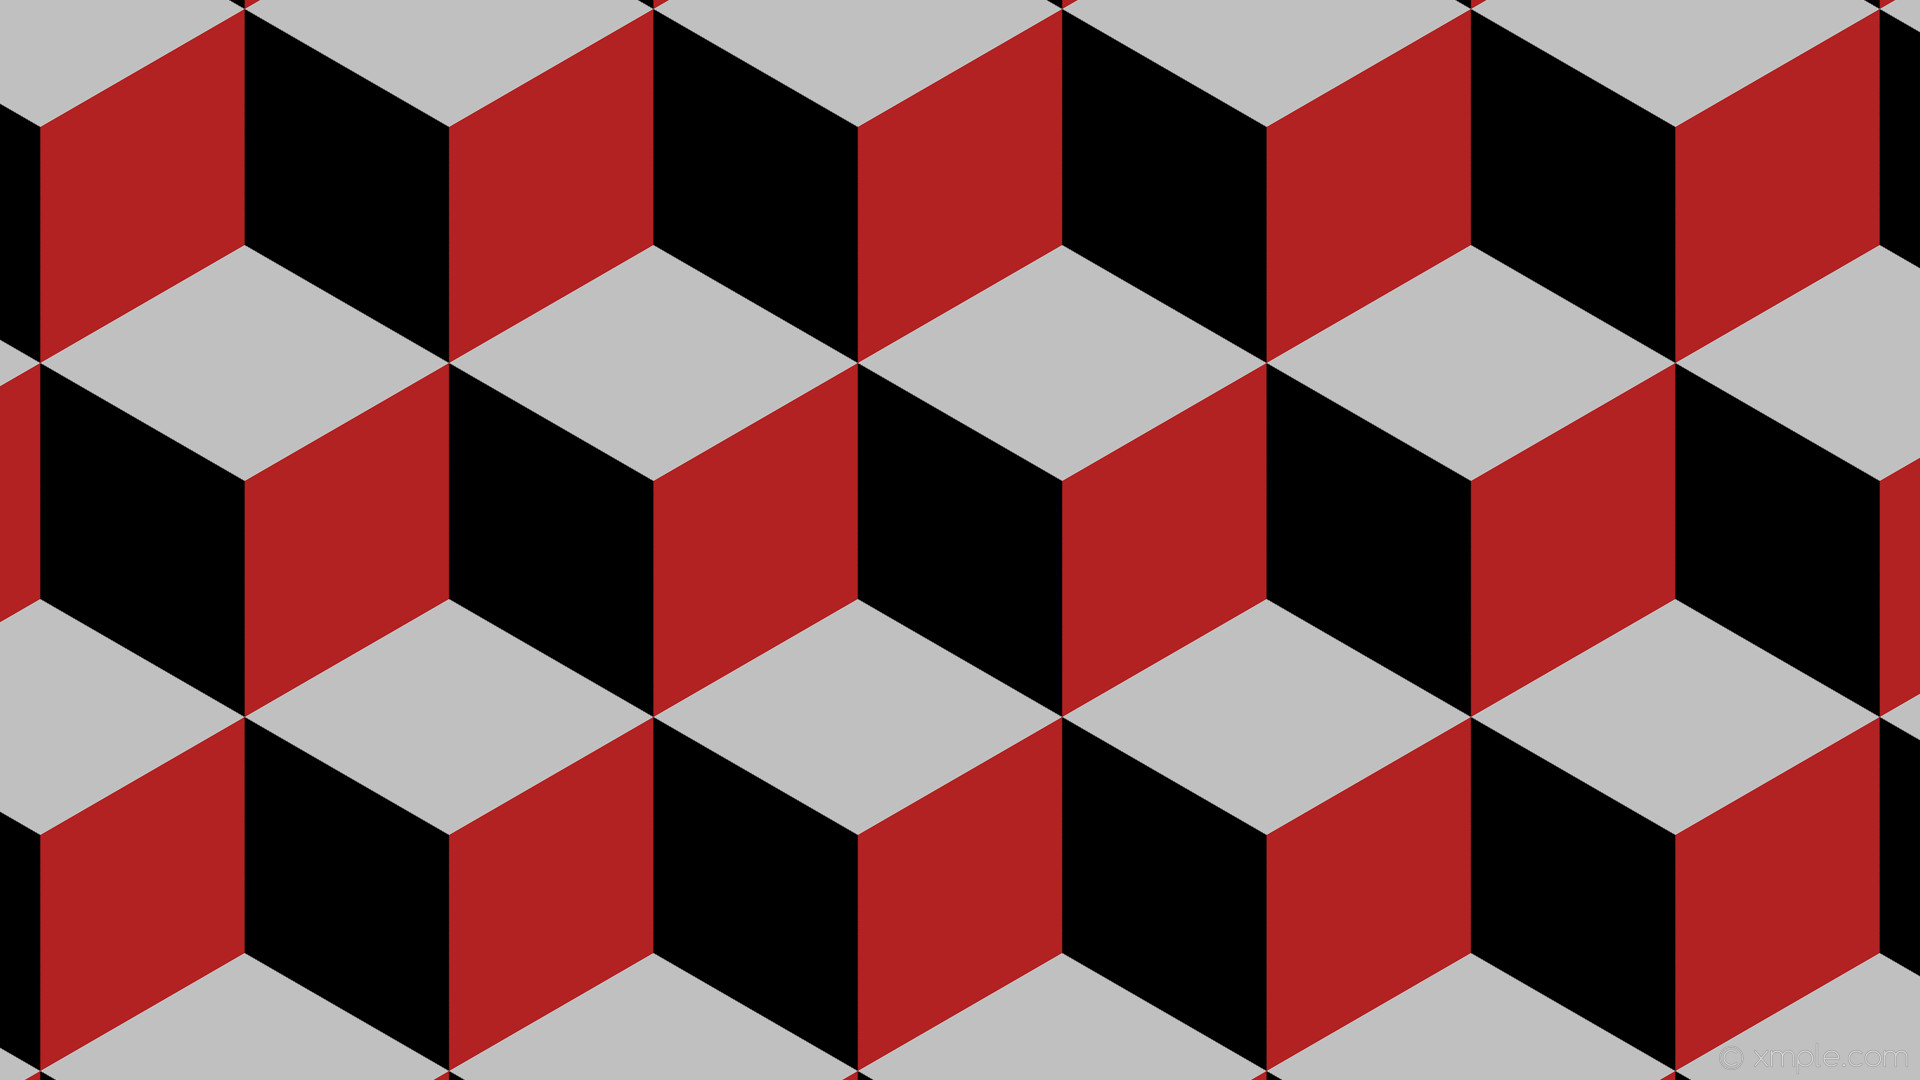 wallpaper red 3d cubes grey black fire brick silver #000000 #b22222 #c0c0c0  120